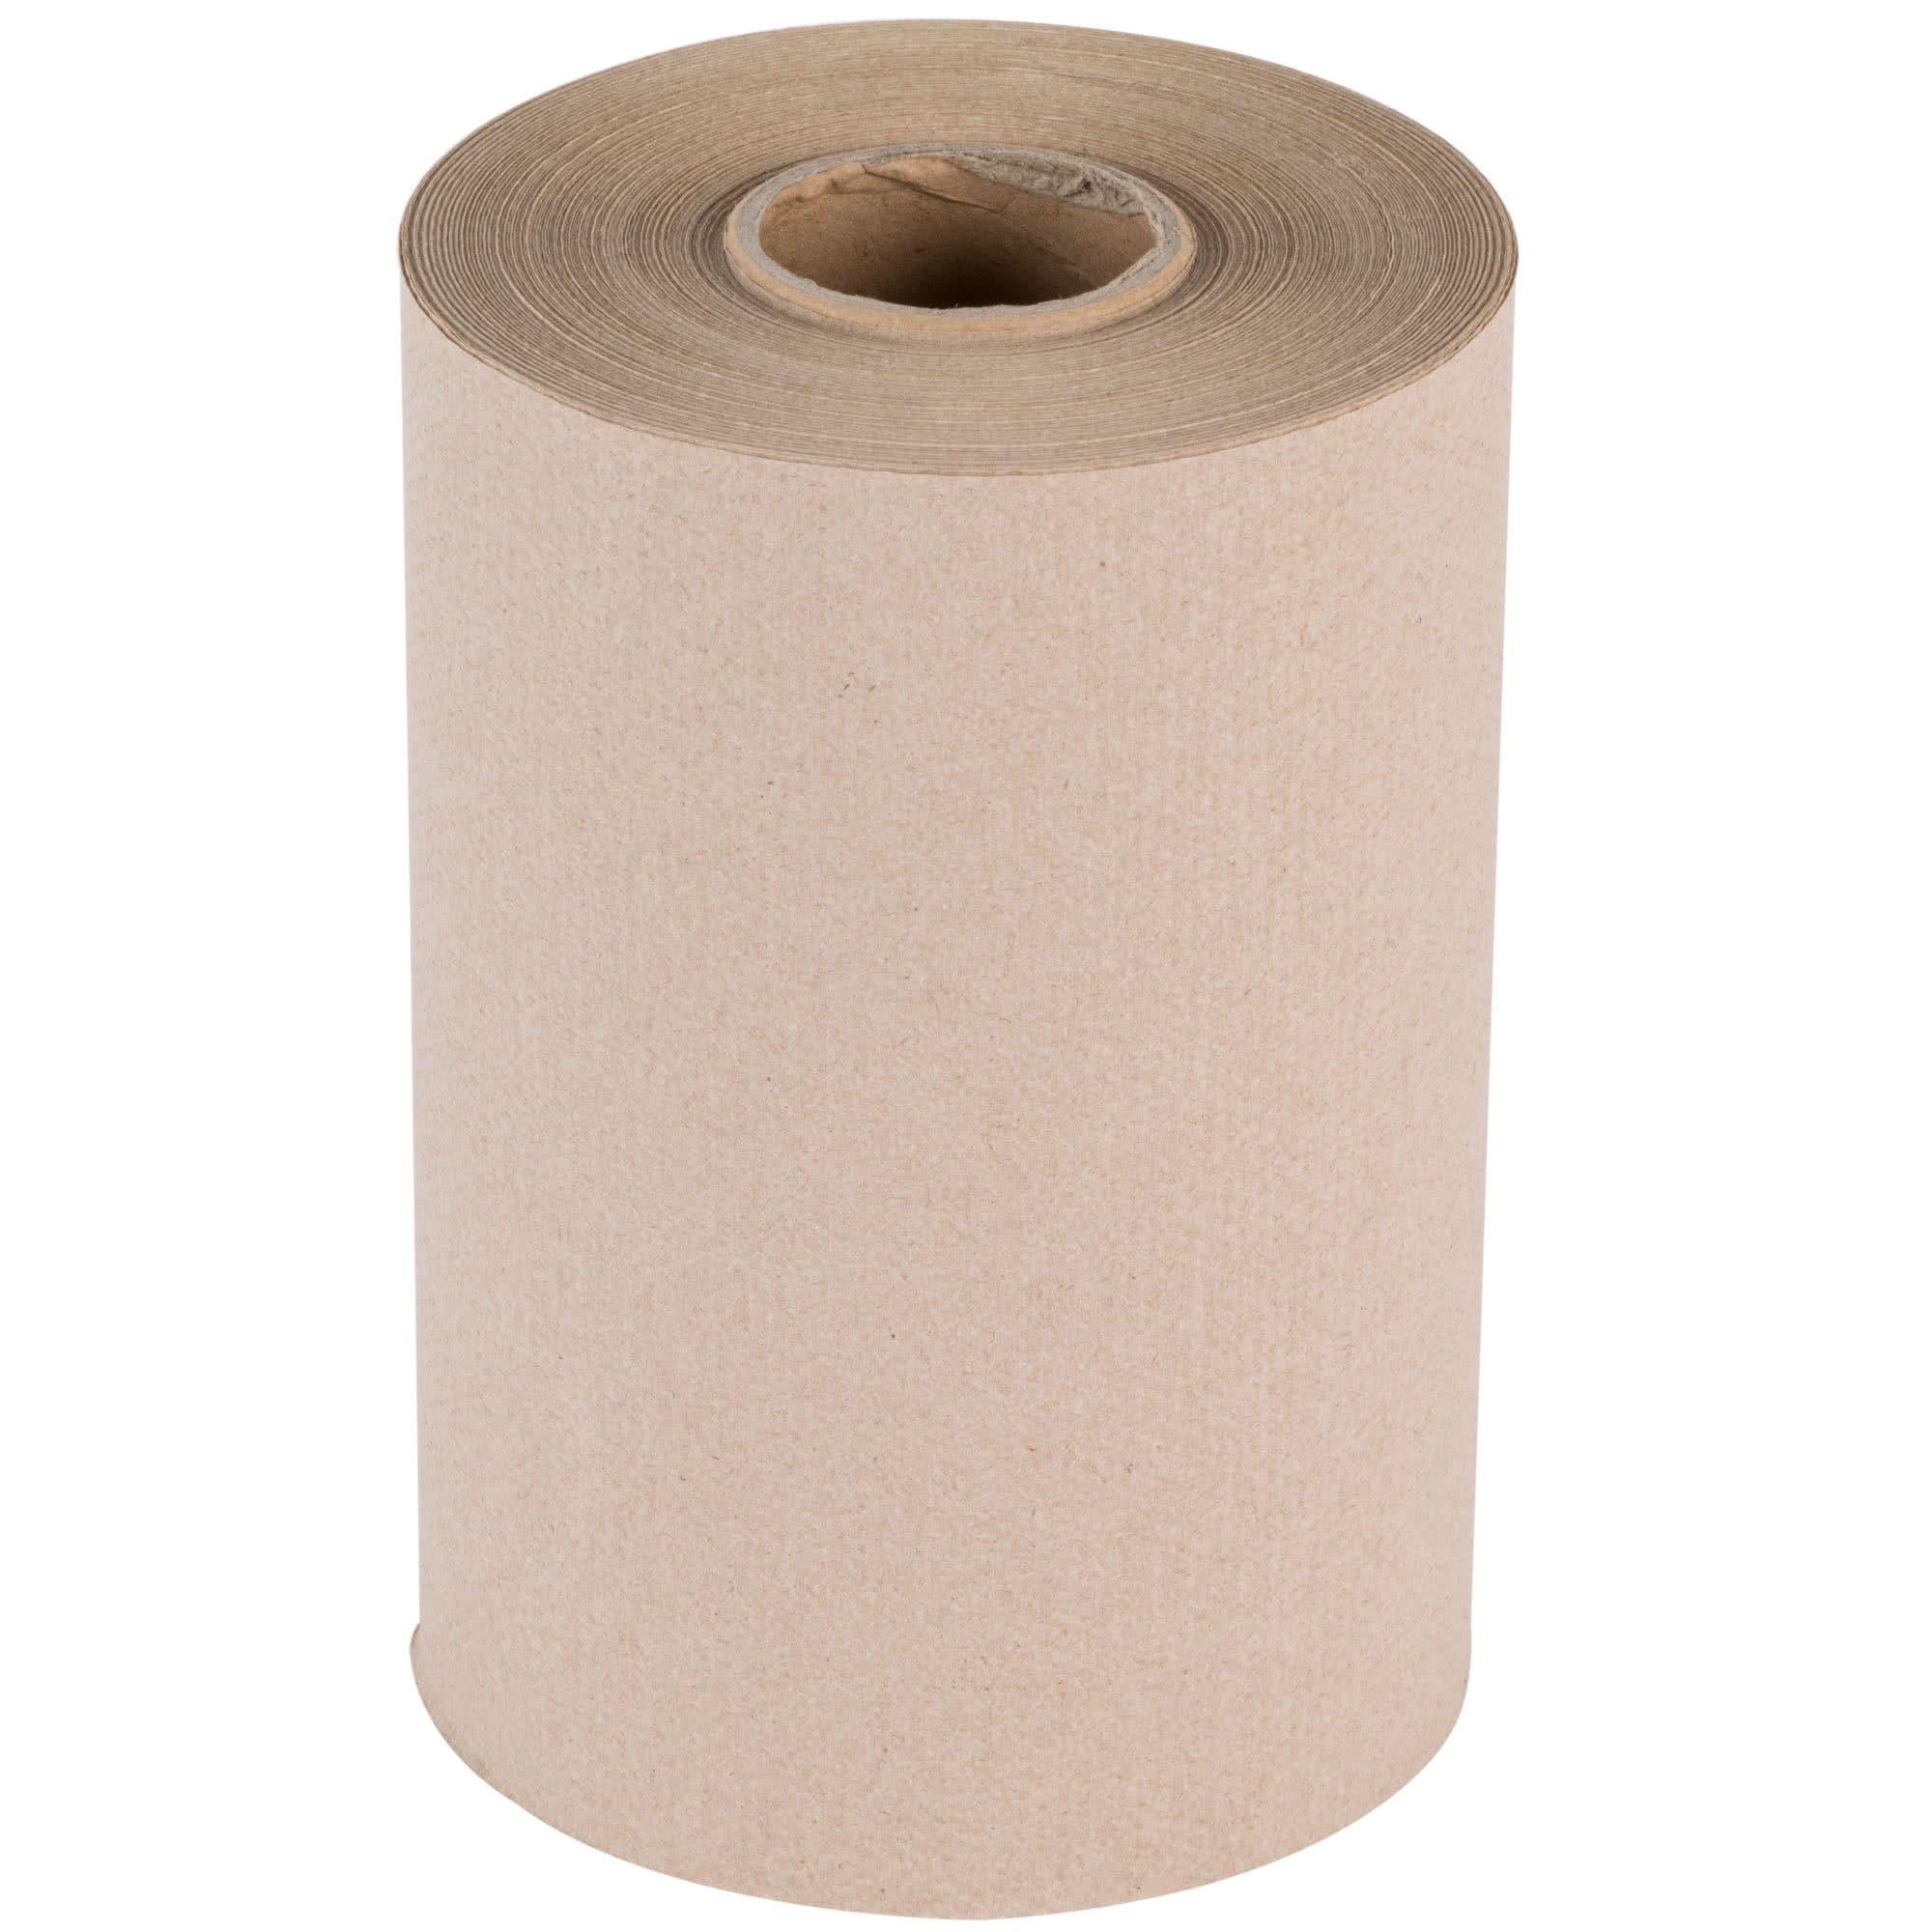 TableTop King Natural Brown Kraft Roll Towel 350 Feet / Roll - 12/Case